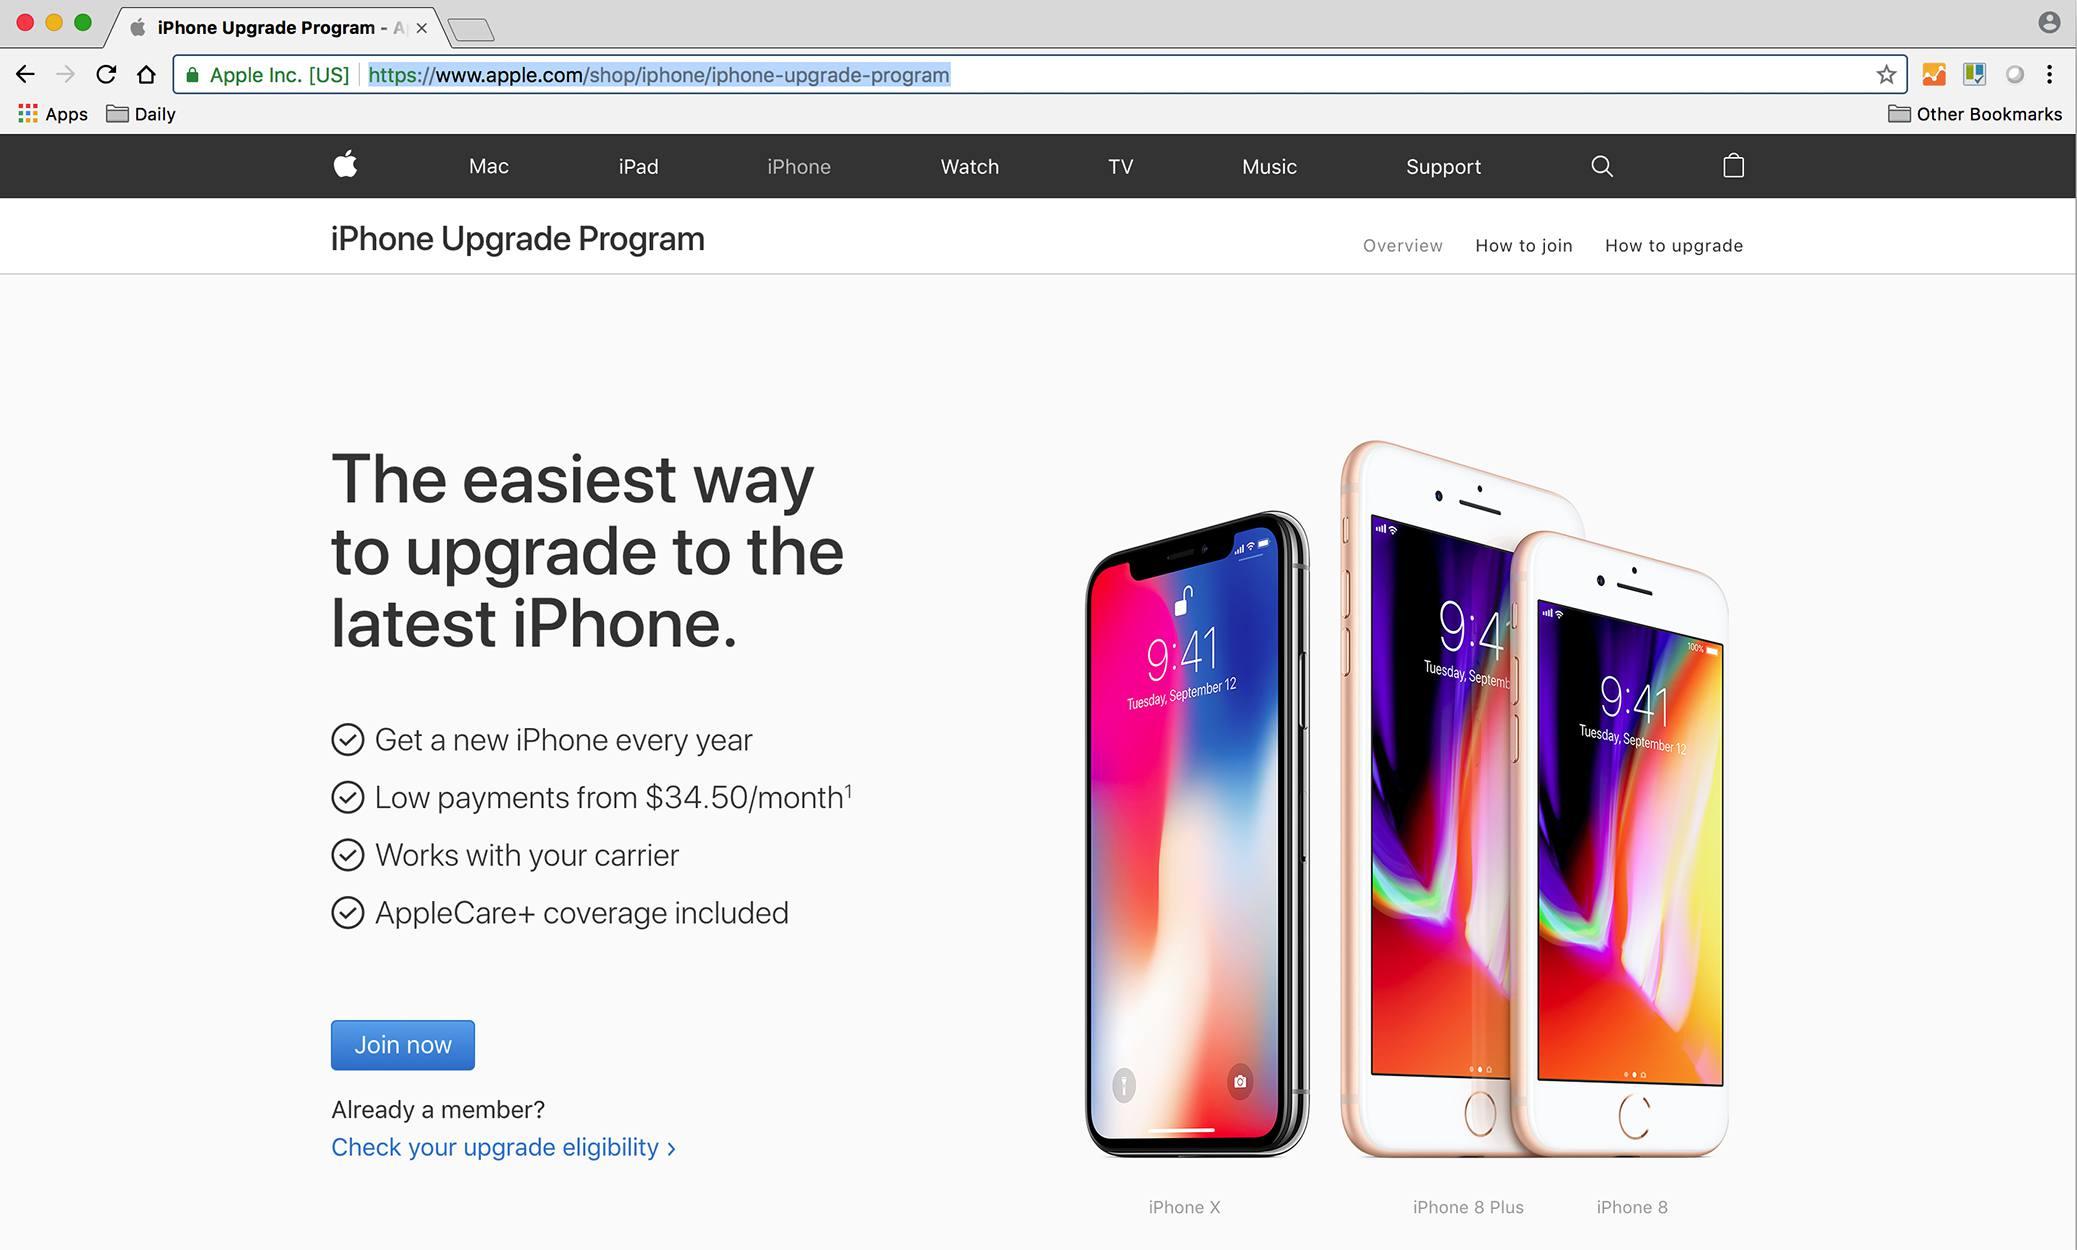 The Apple iPhone Upgrade Program: How It Works